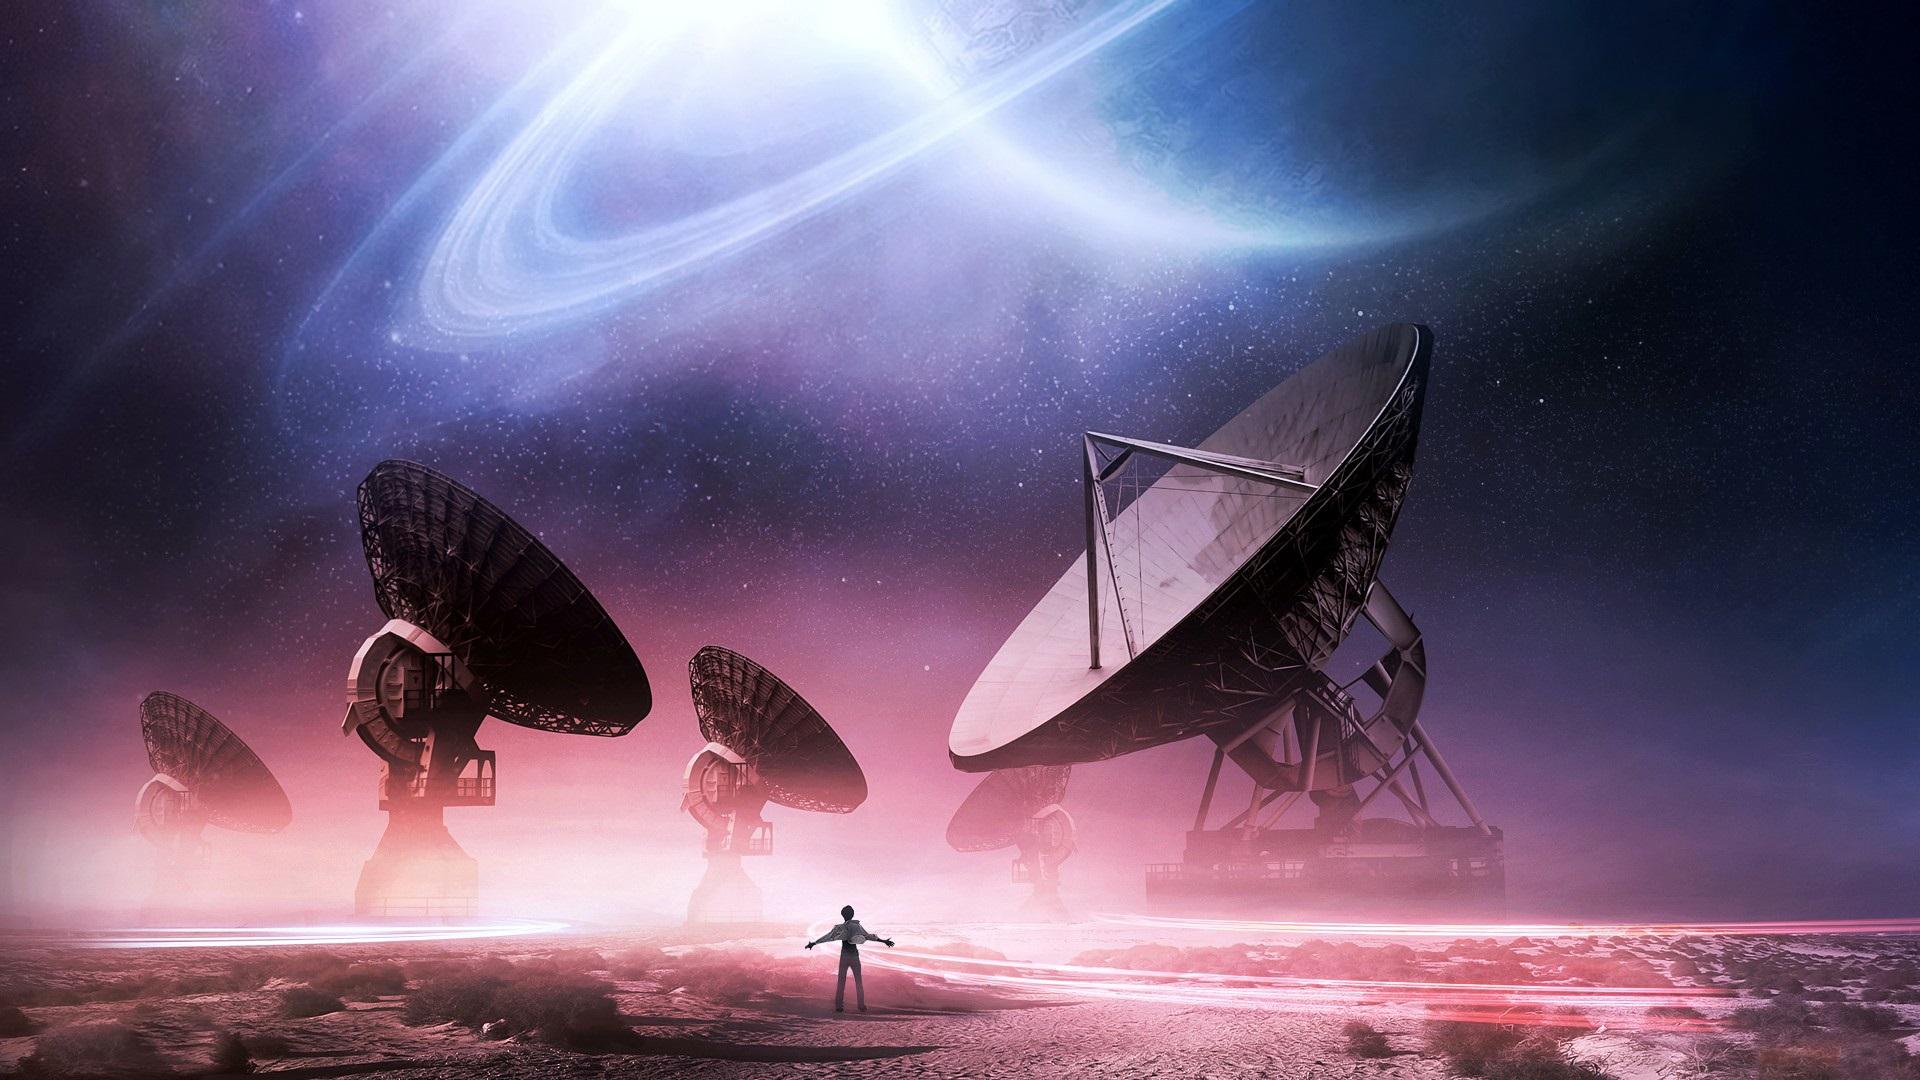 Fondos De Pantalla Antenas Espacio Estrellas Planetas